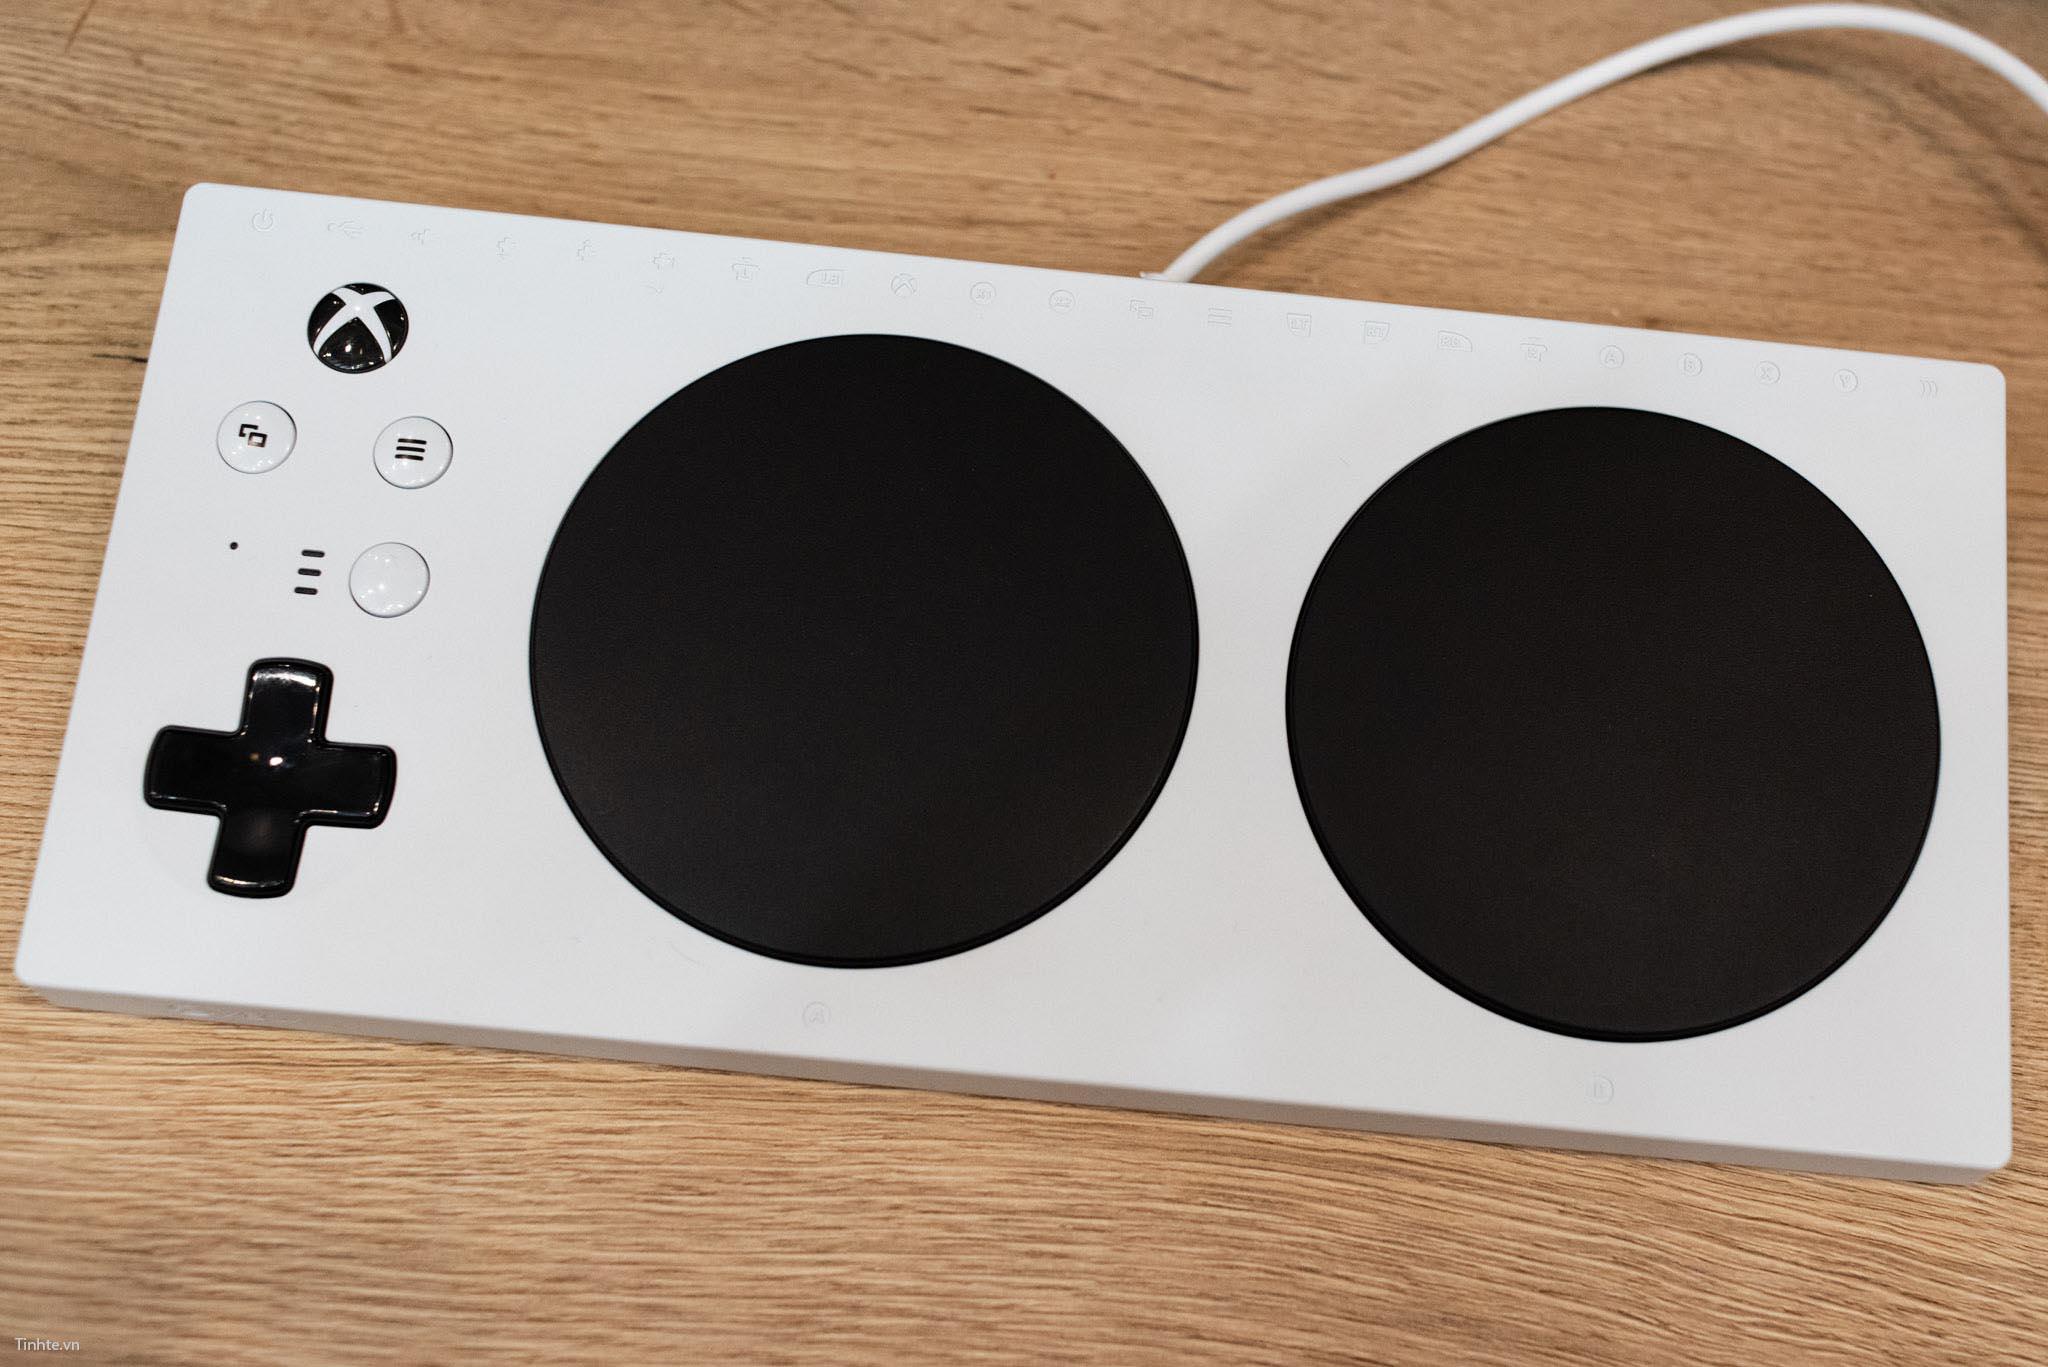 Tinhte.vn_XboxAdaptiveController-1.jpg